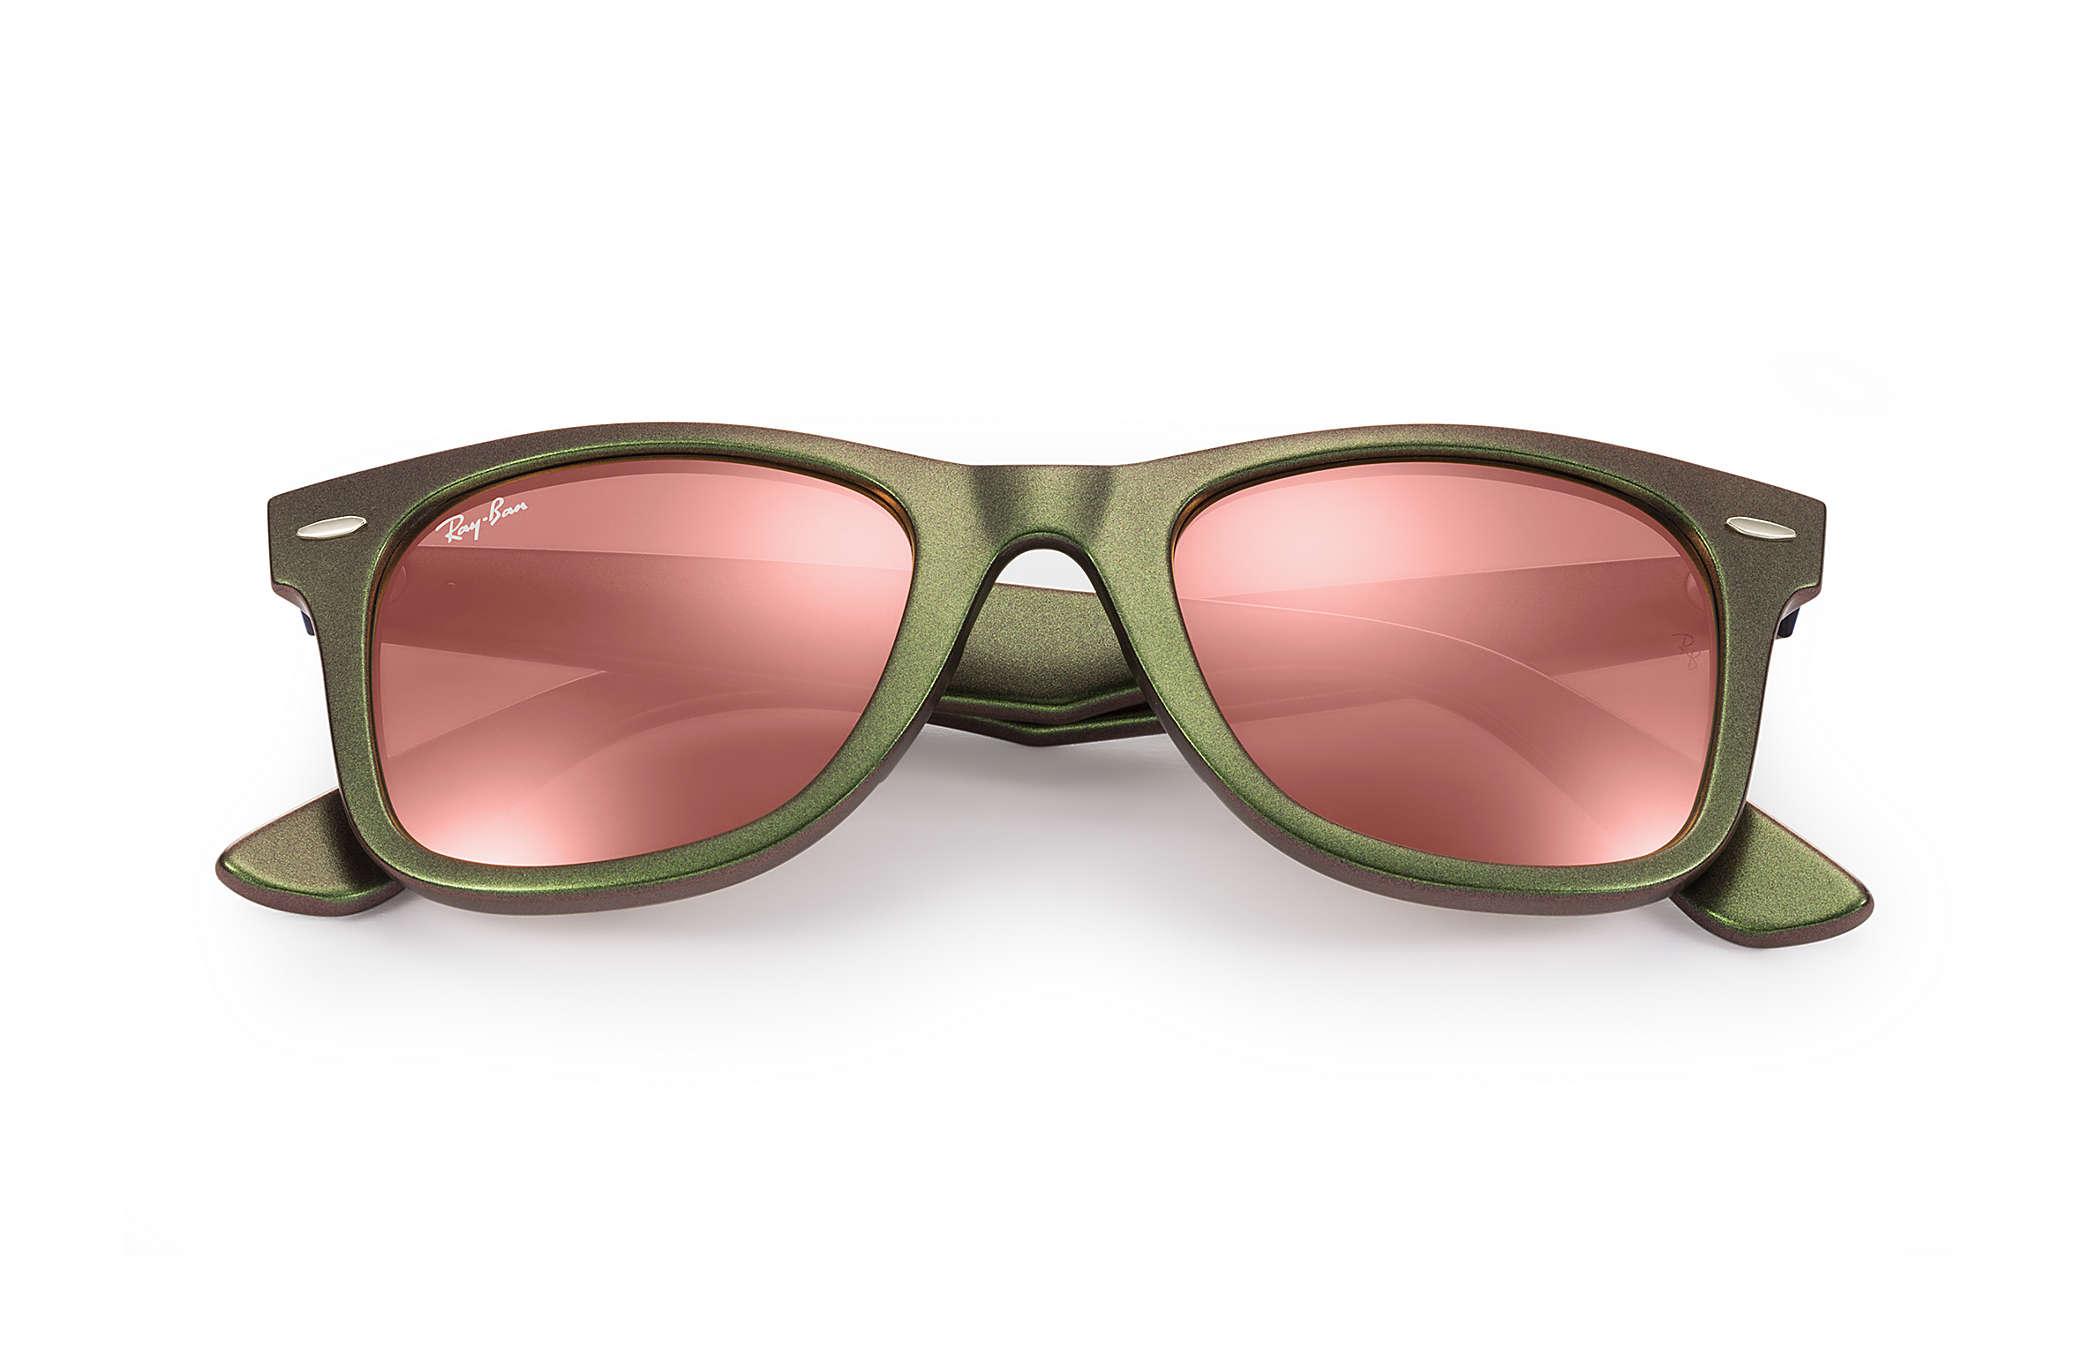 b091efcae5016 Ray-Ban Original Wayfarer Cosmo RB2140 Pink - Acetate - Copper ...